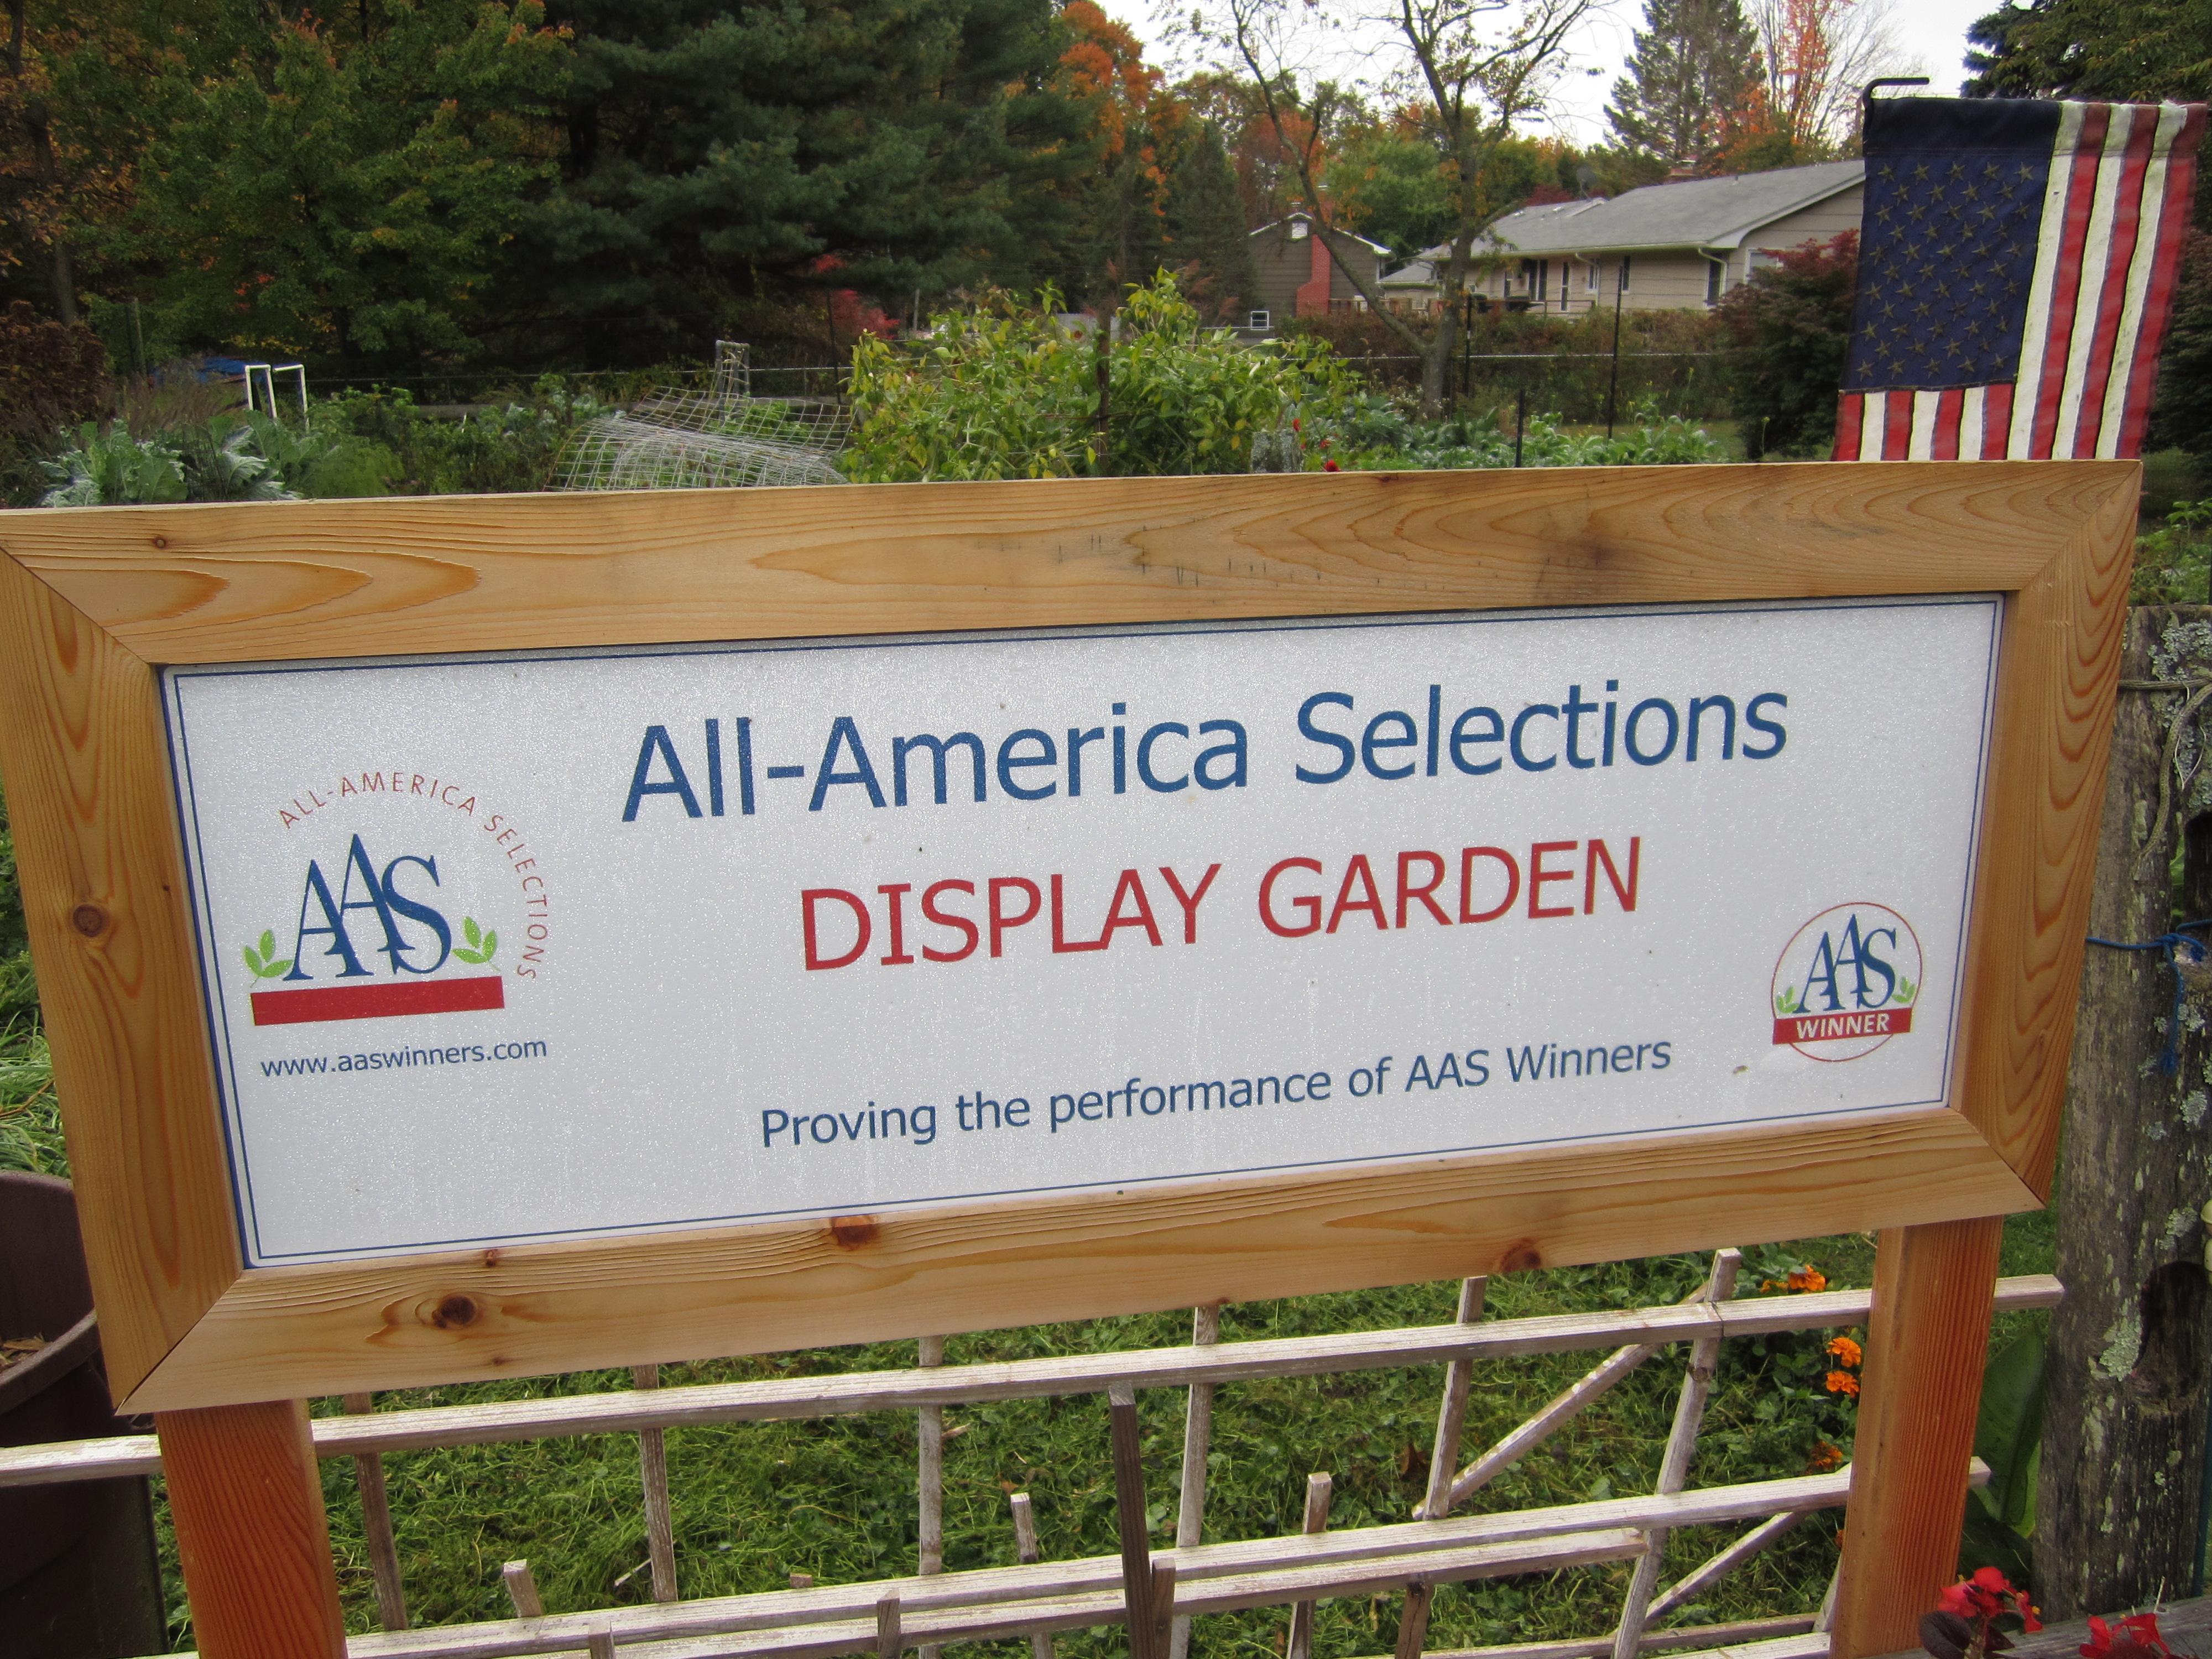 Did You Know Fairfield Has A Community Garden